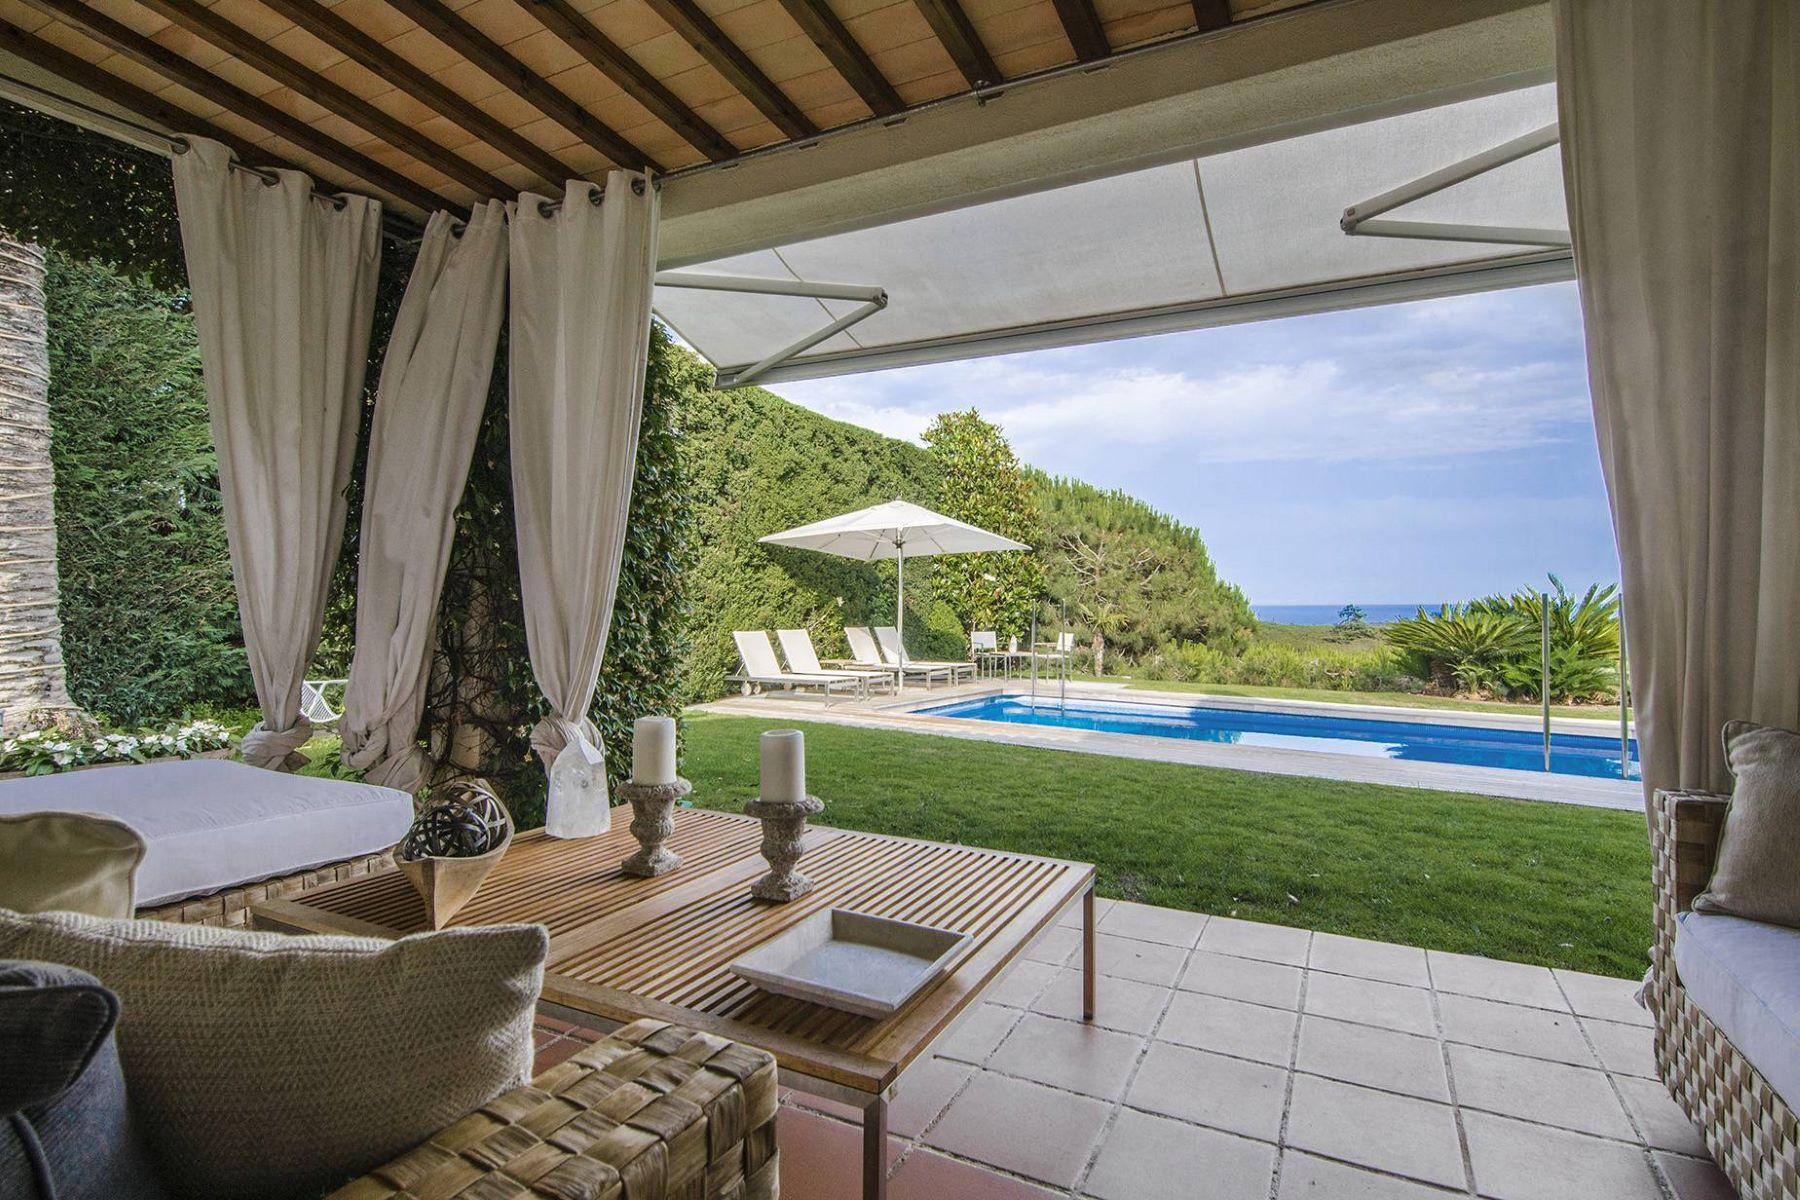 Tek Ailelik Ev için Satış at A real treat with stunning sea views in Supermaresme Sant Andreu De Llavaneres, Barcelona, 08392 Ispanya